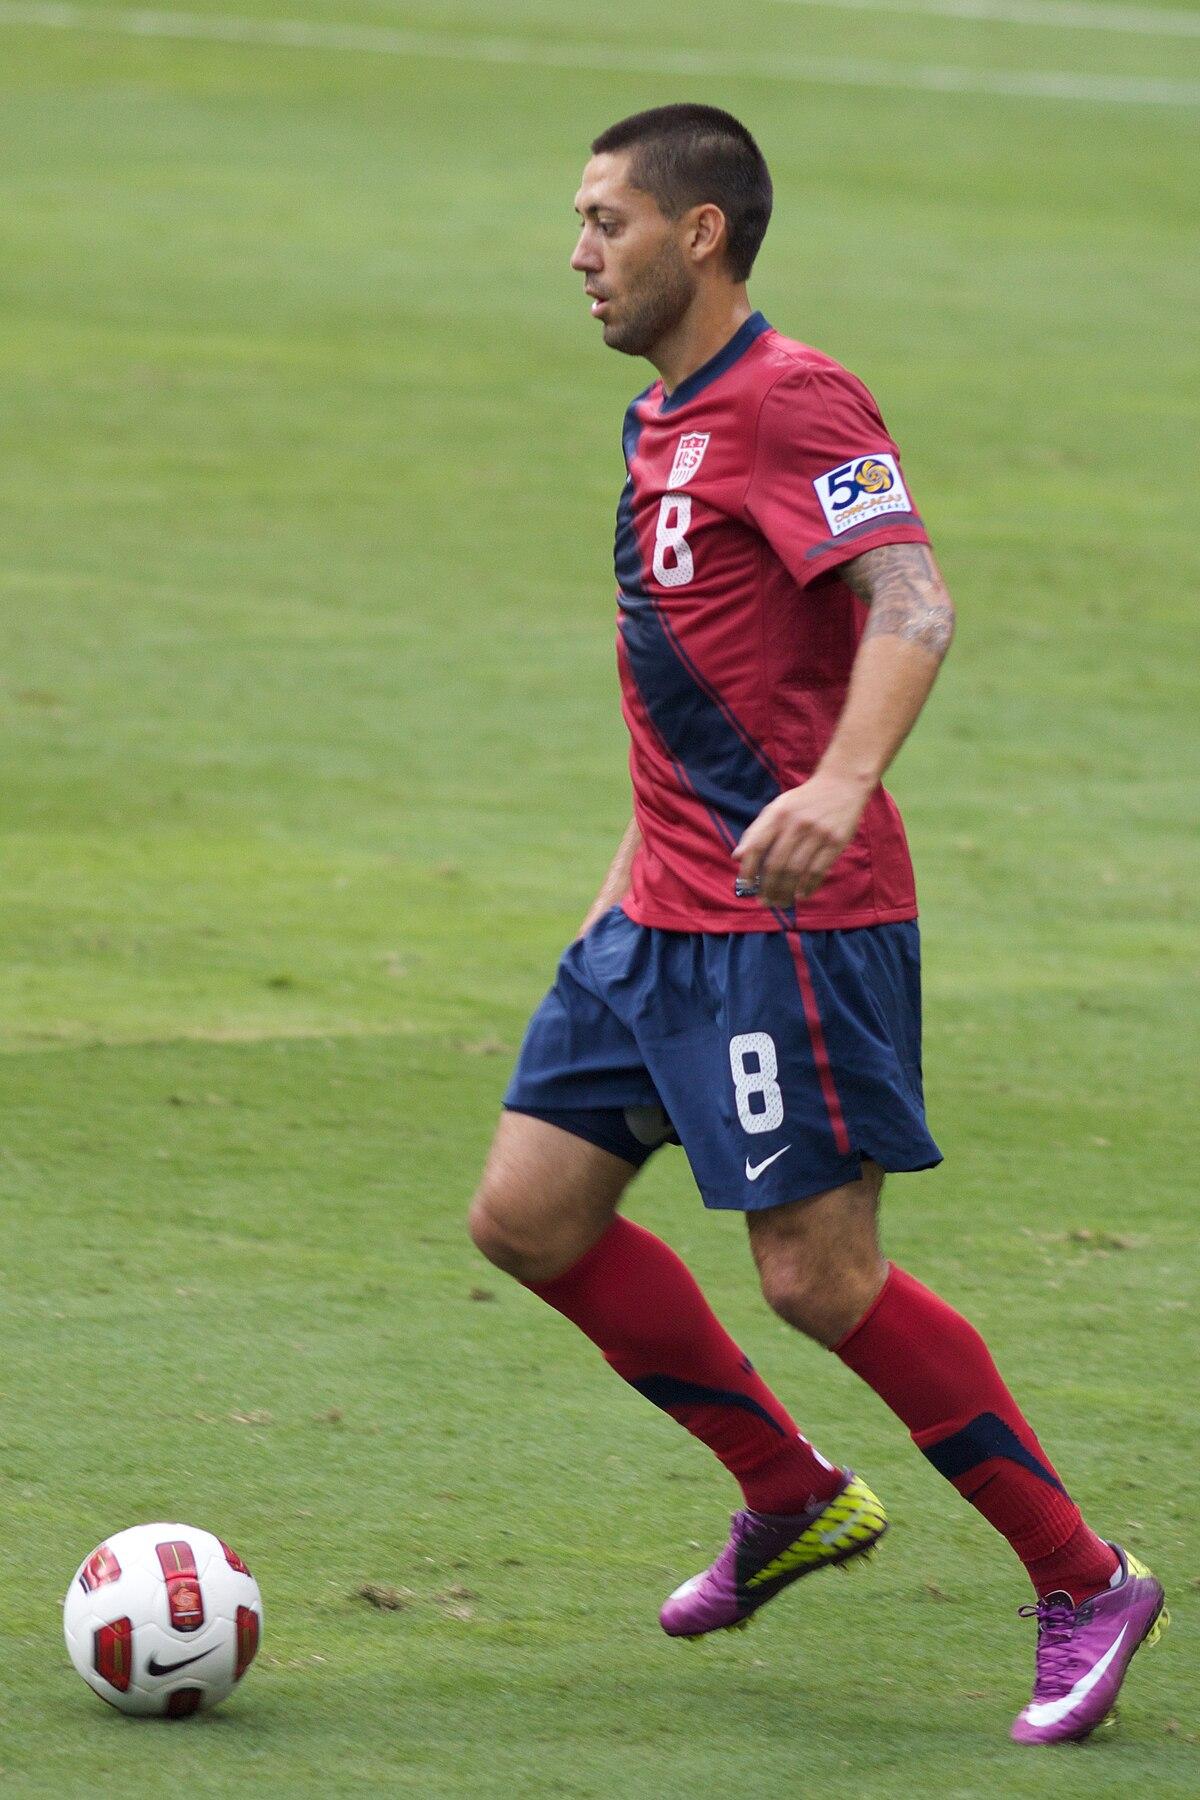 016cbb62e6f List of international goals scored by Clint Dempsey - Wikipedia